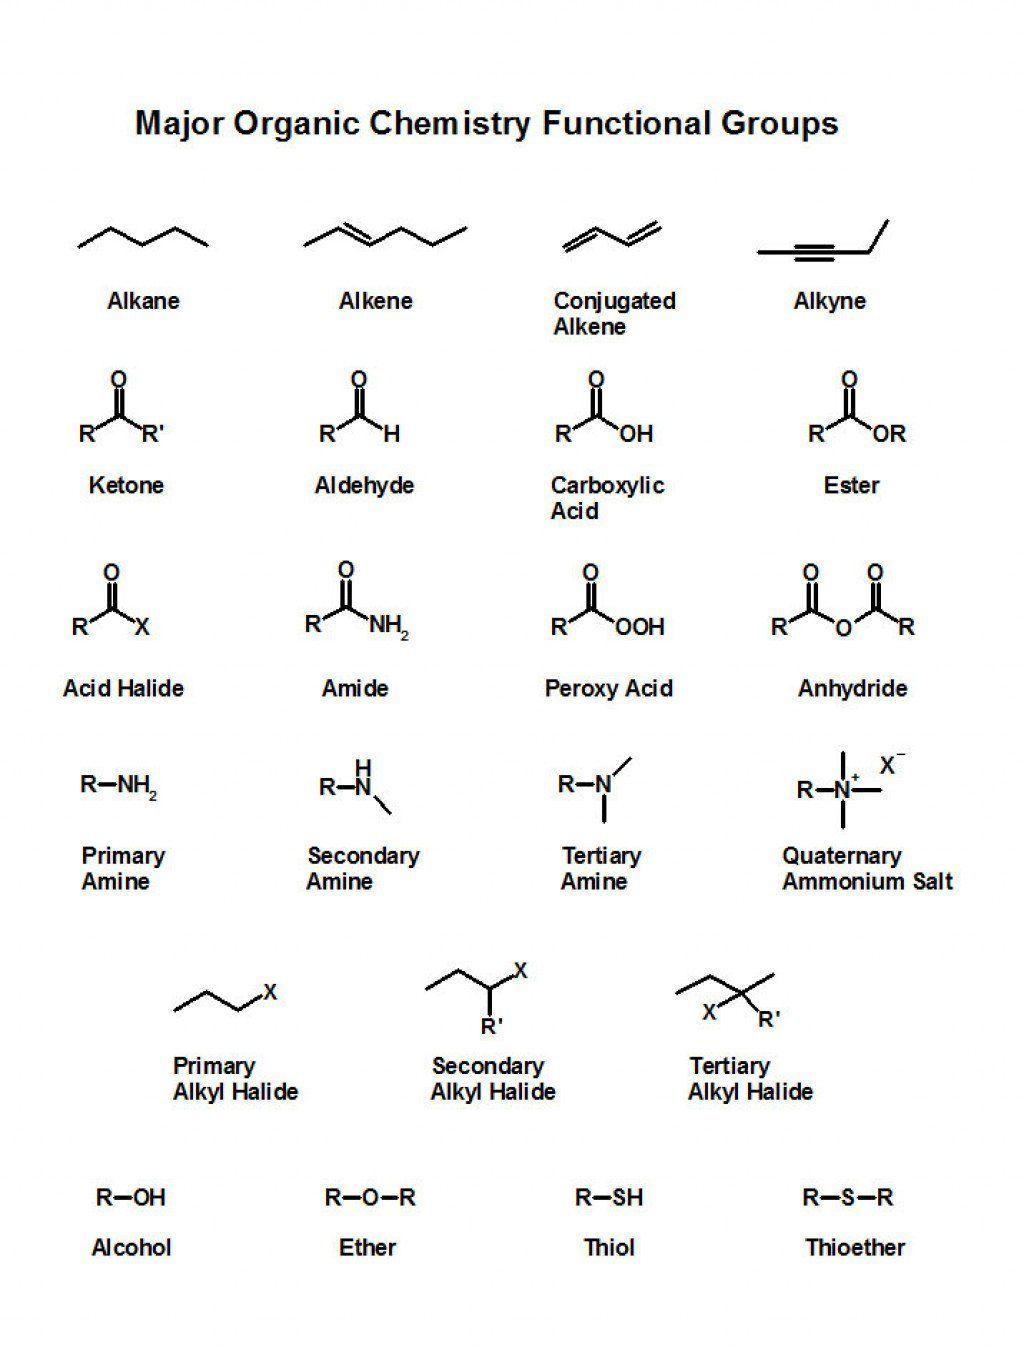 Organic Chemistry 101 Nomenclature In 2020 Organic Chemistry Study Organic Chemistry Science Chemistry